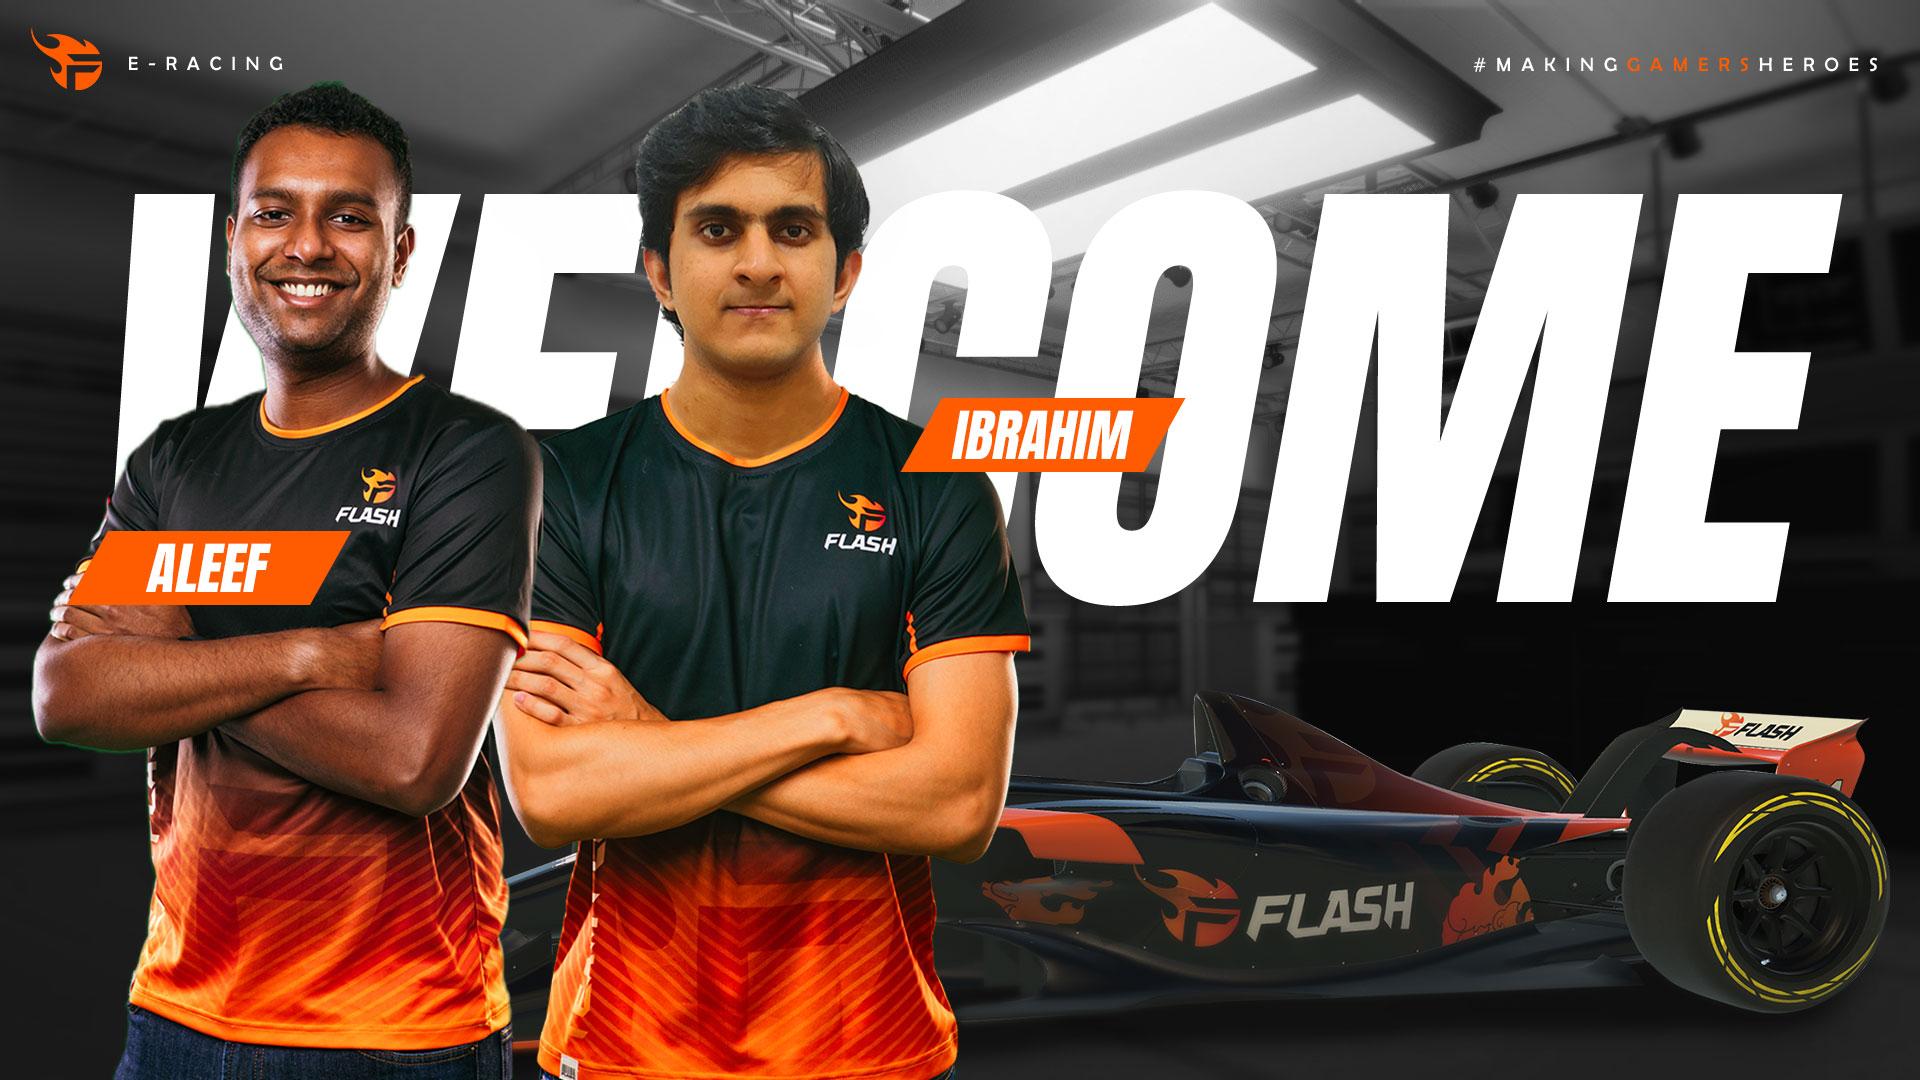 Team Flash tham gia giải E1 Championship mùa sắp tới